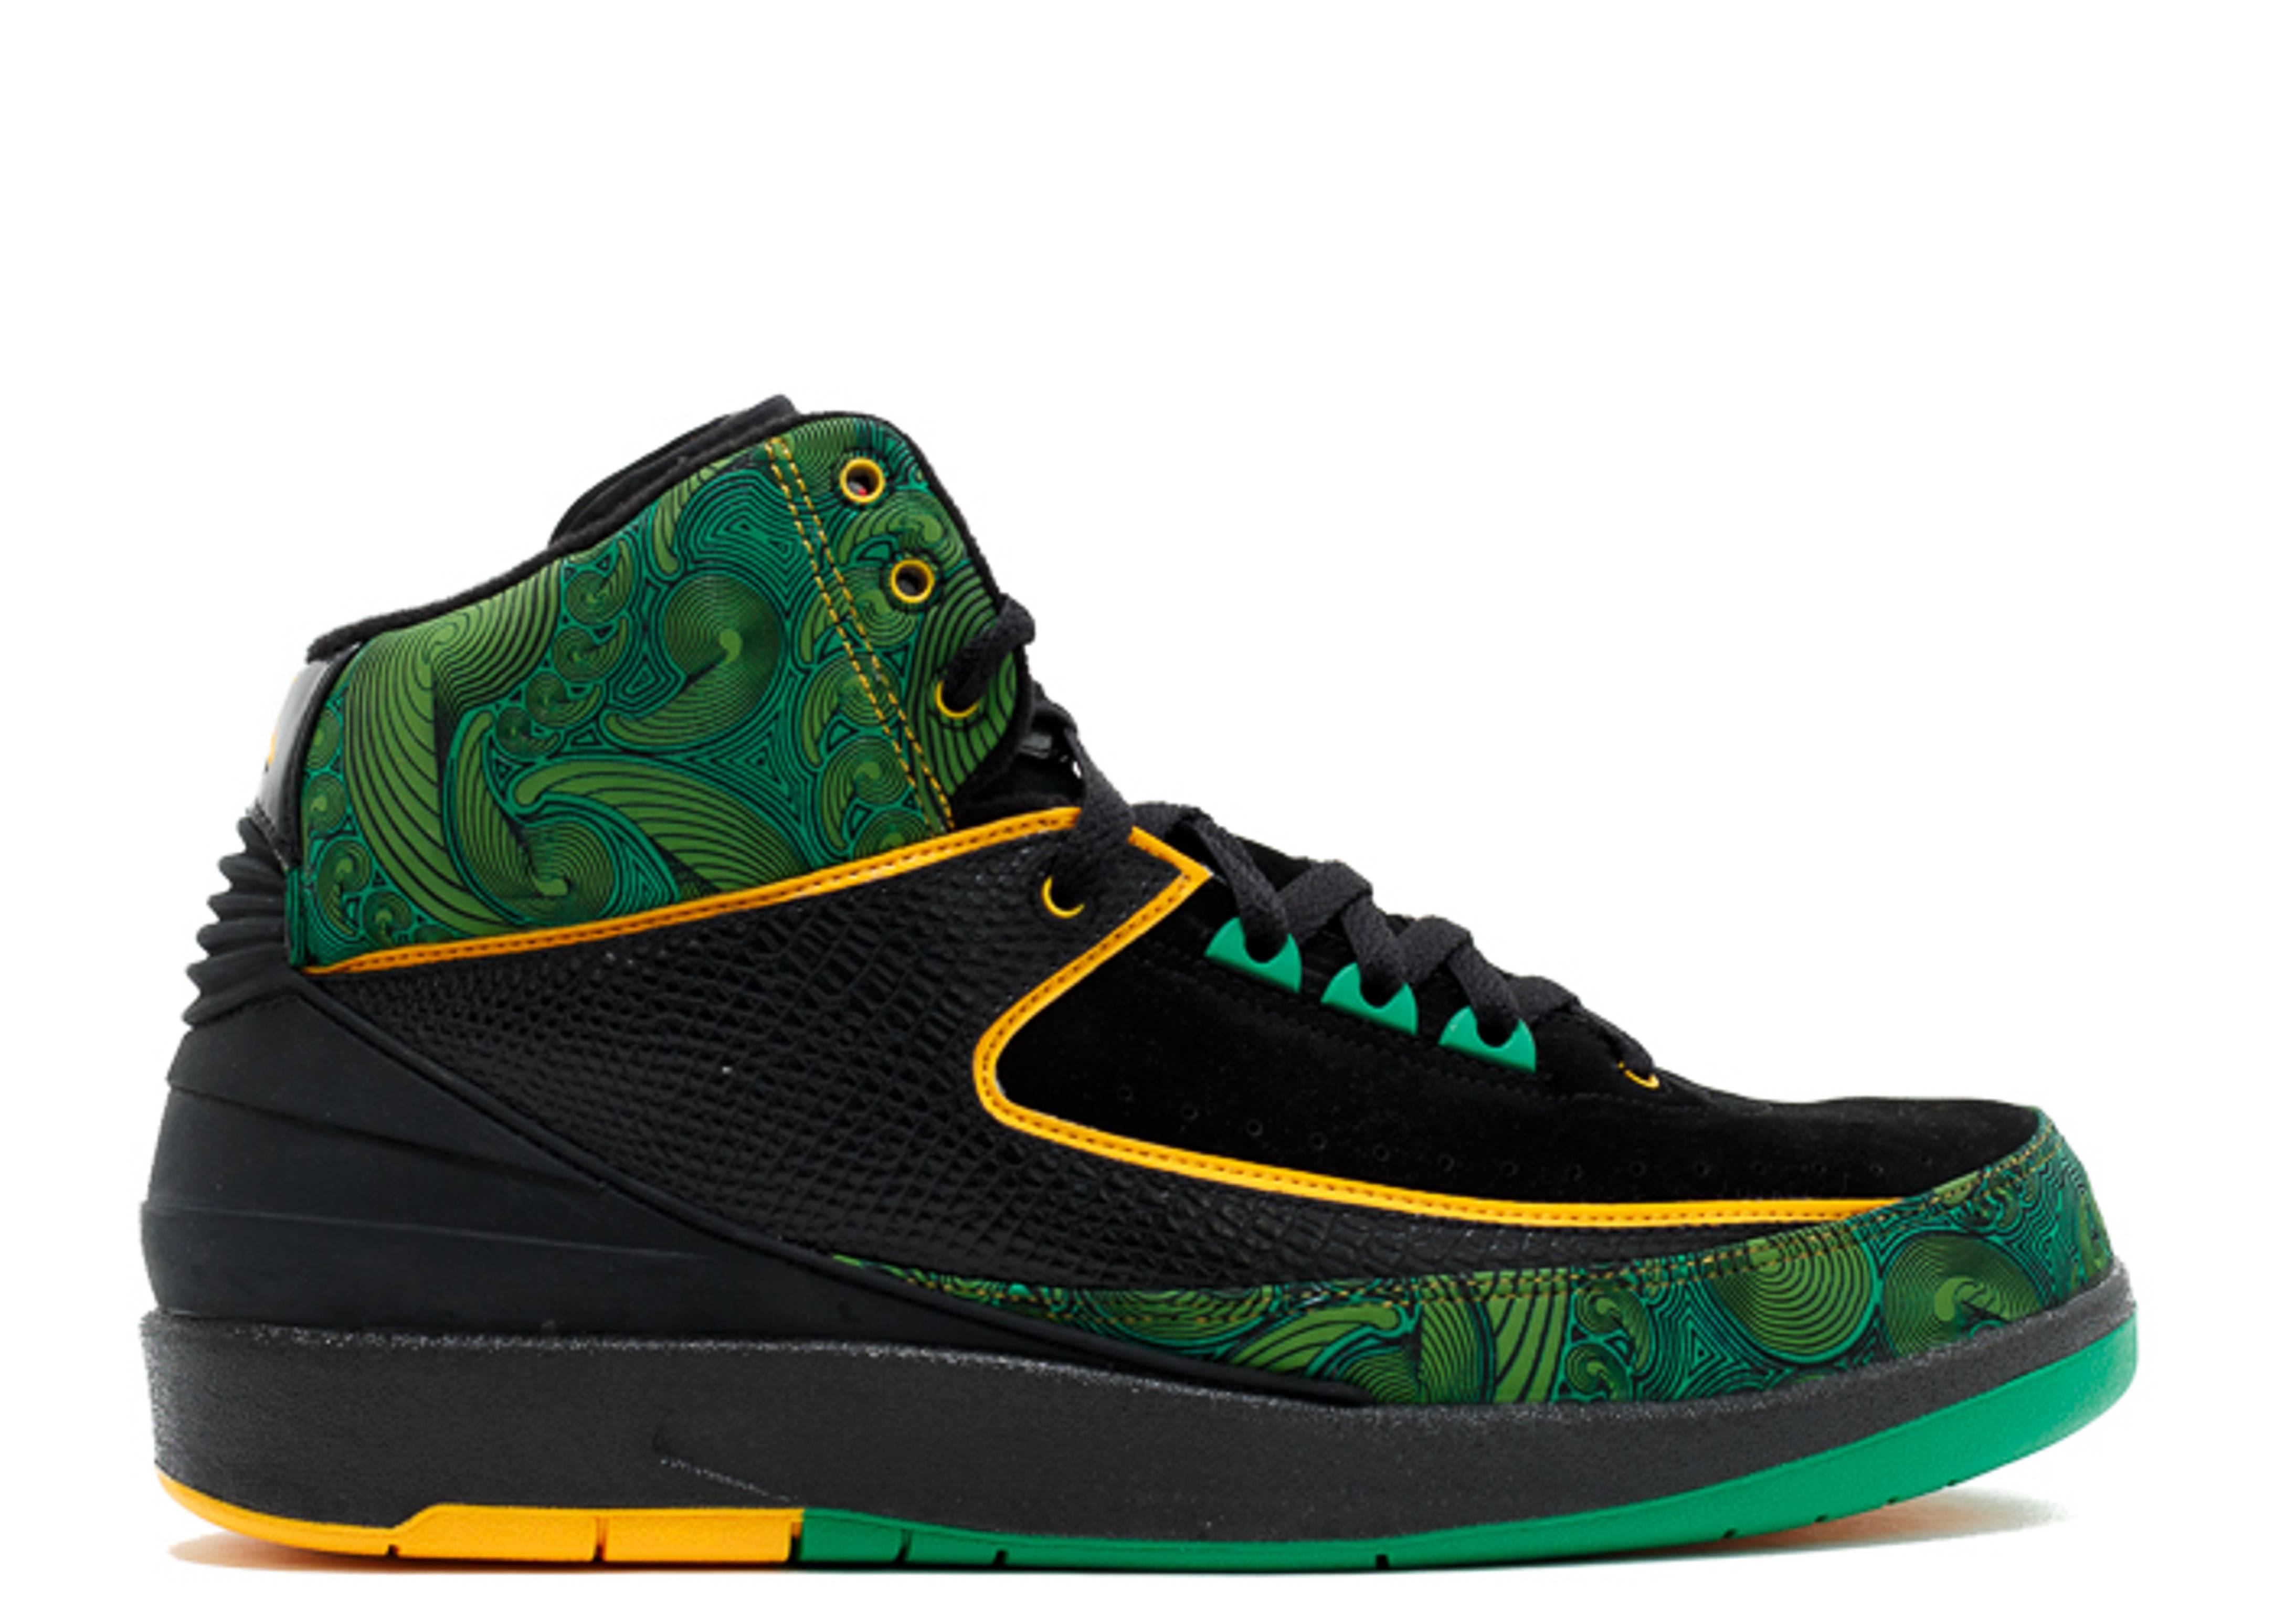 Nike Jordan 2